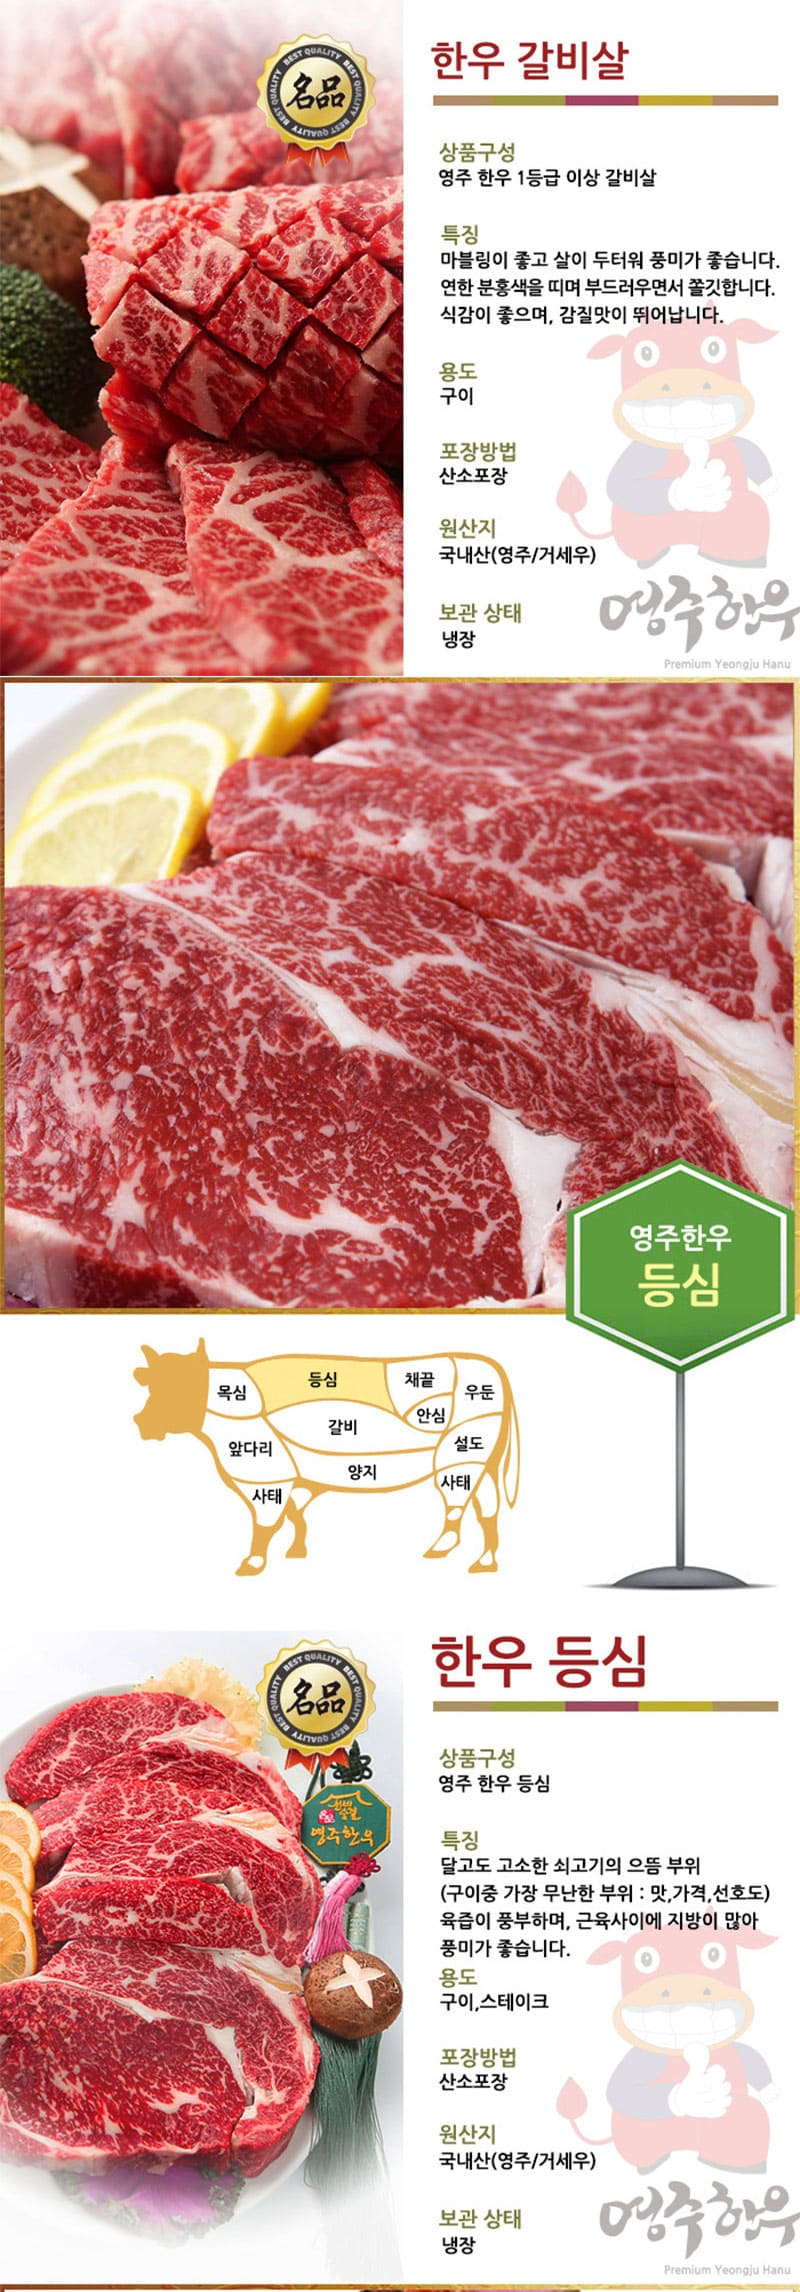 yeongjuchughyeob-myeongpum-set_detail_02.jpg